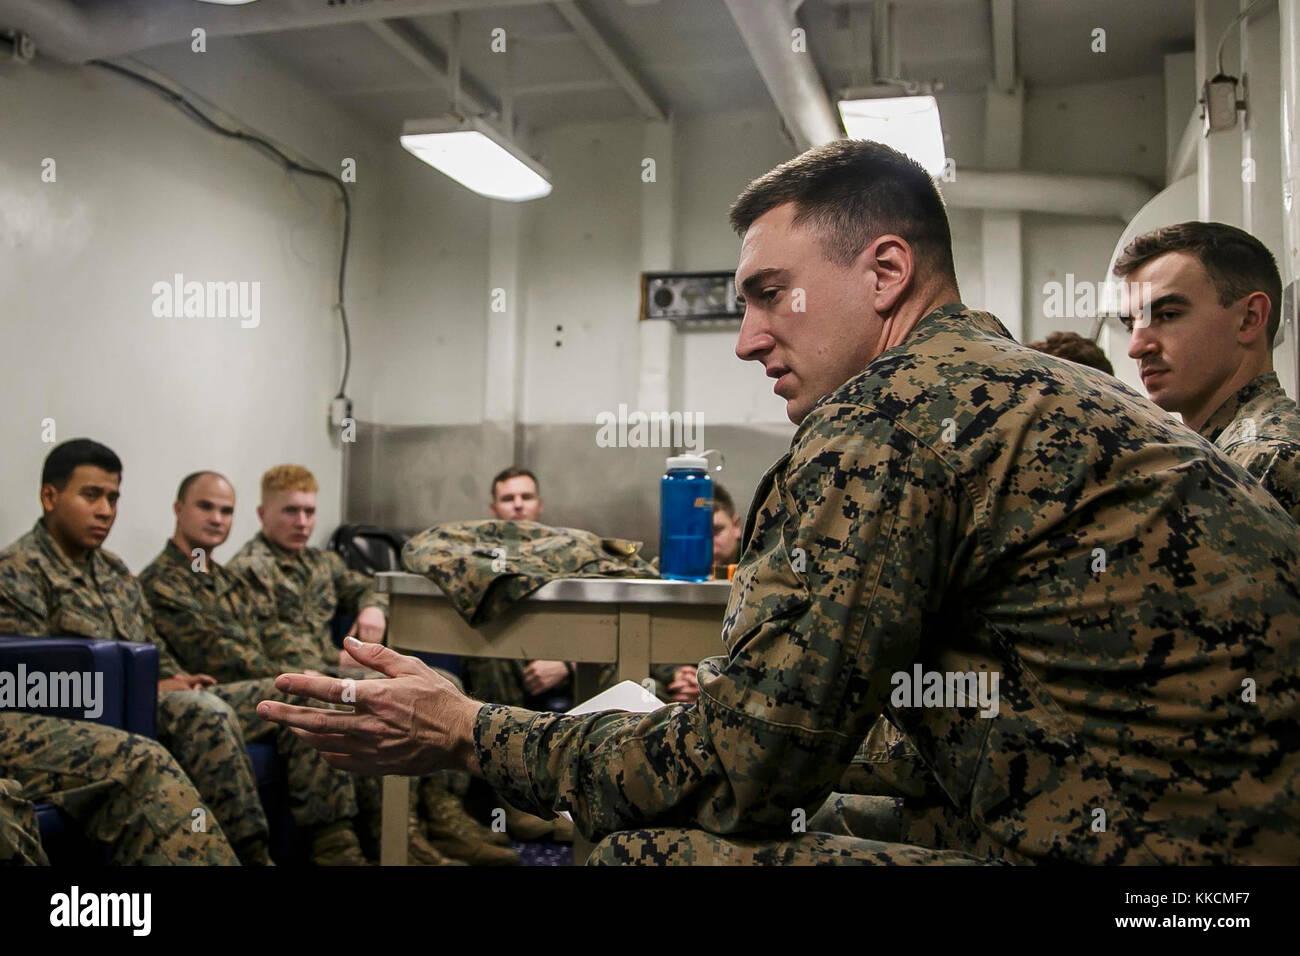 U.S. Marine Corps Sgt. Sean A. O'Neill, an infantryman with Fox Company, 2nd Battalion, 6th Marine Regiment, - Stock Image